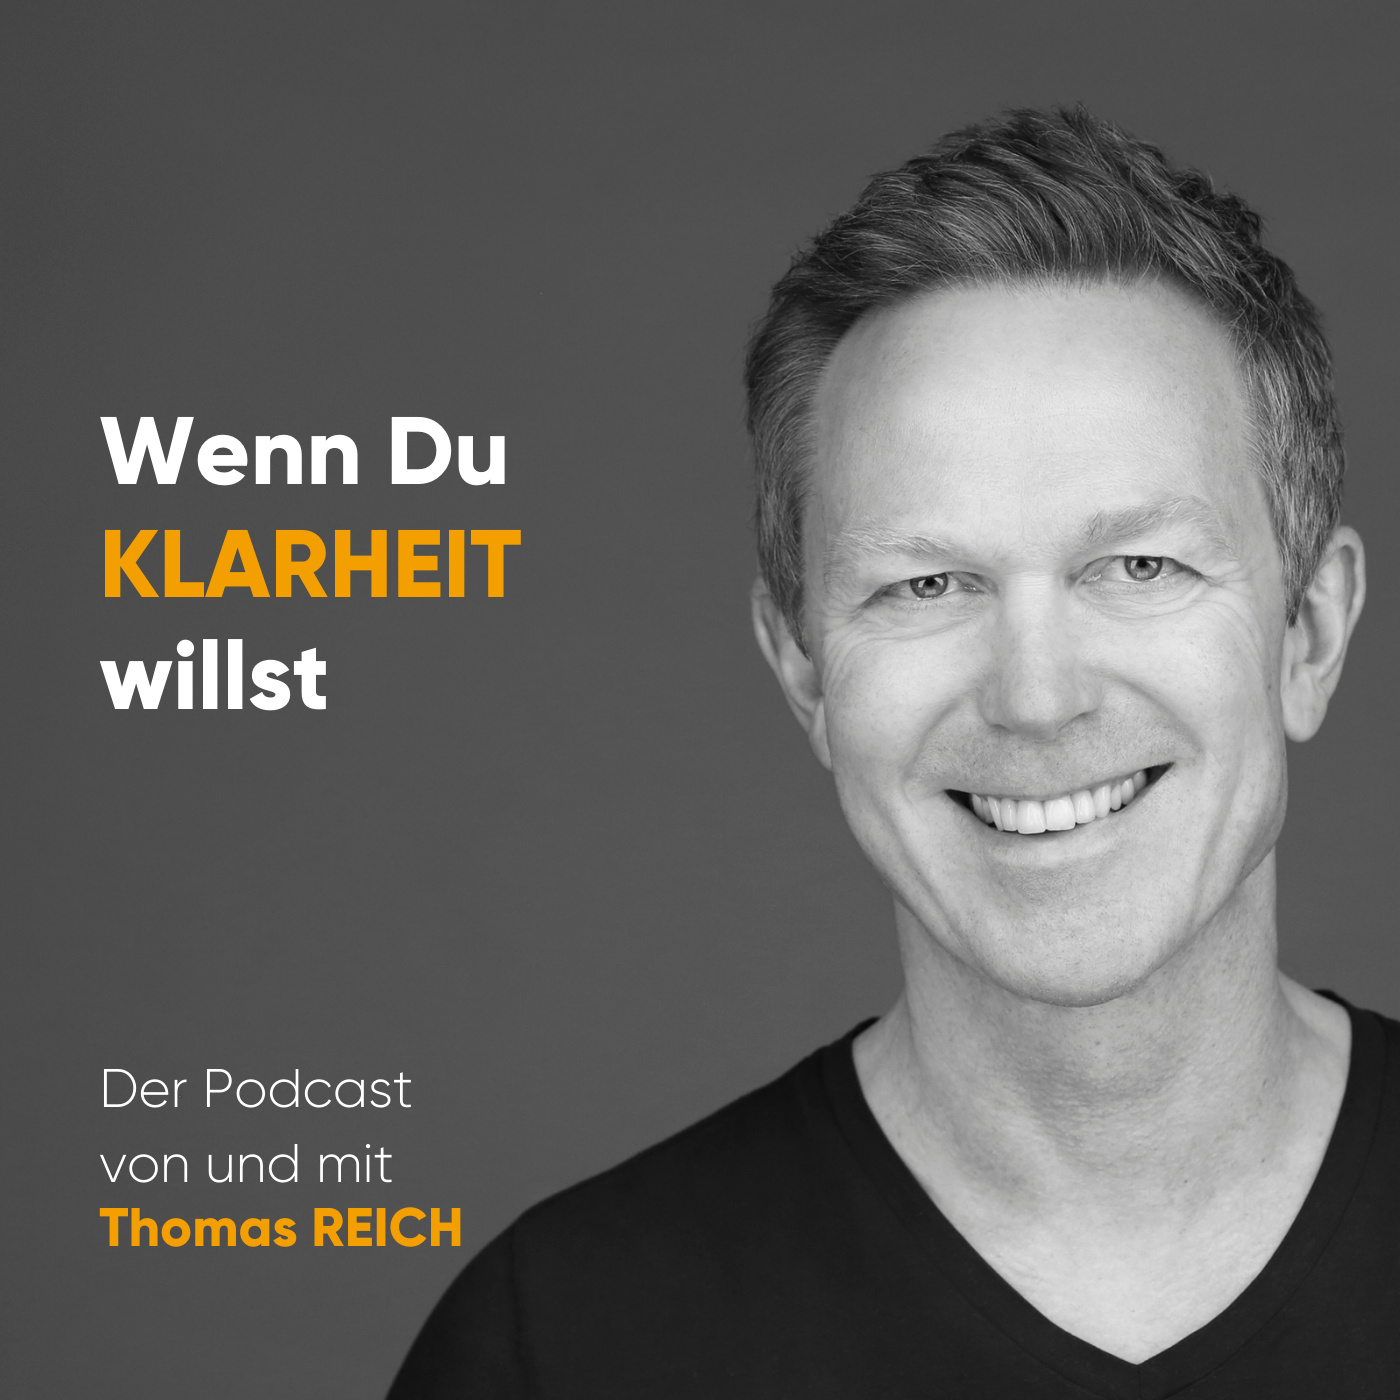 Artwork for #469 - What´s your Number? Lasst uns über Geld reden. Thomas interviewt Markus